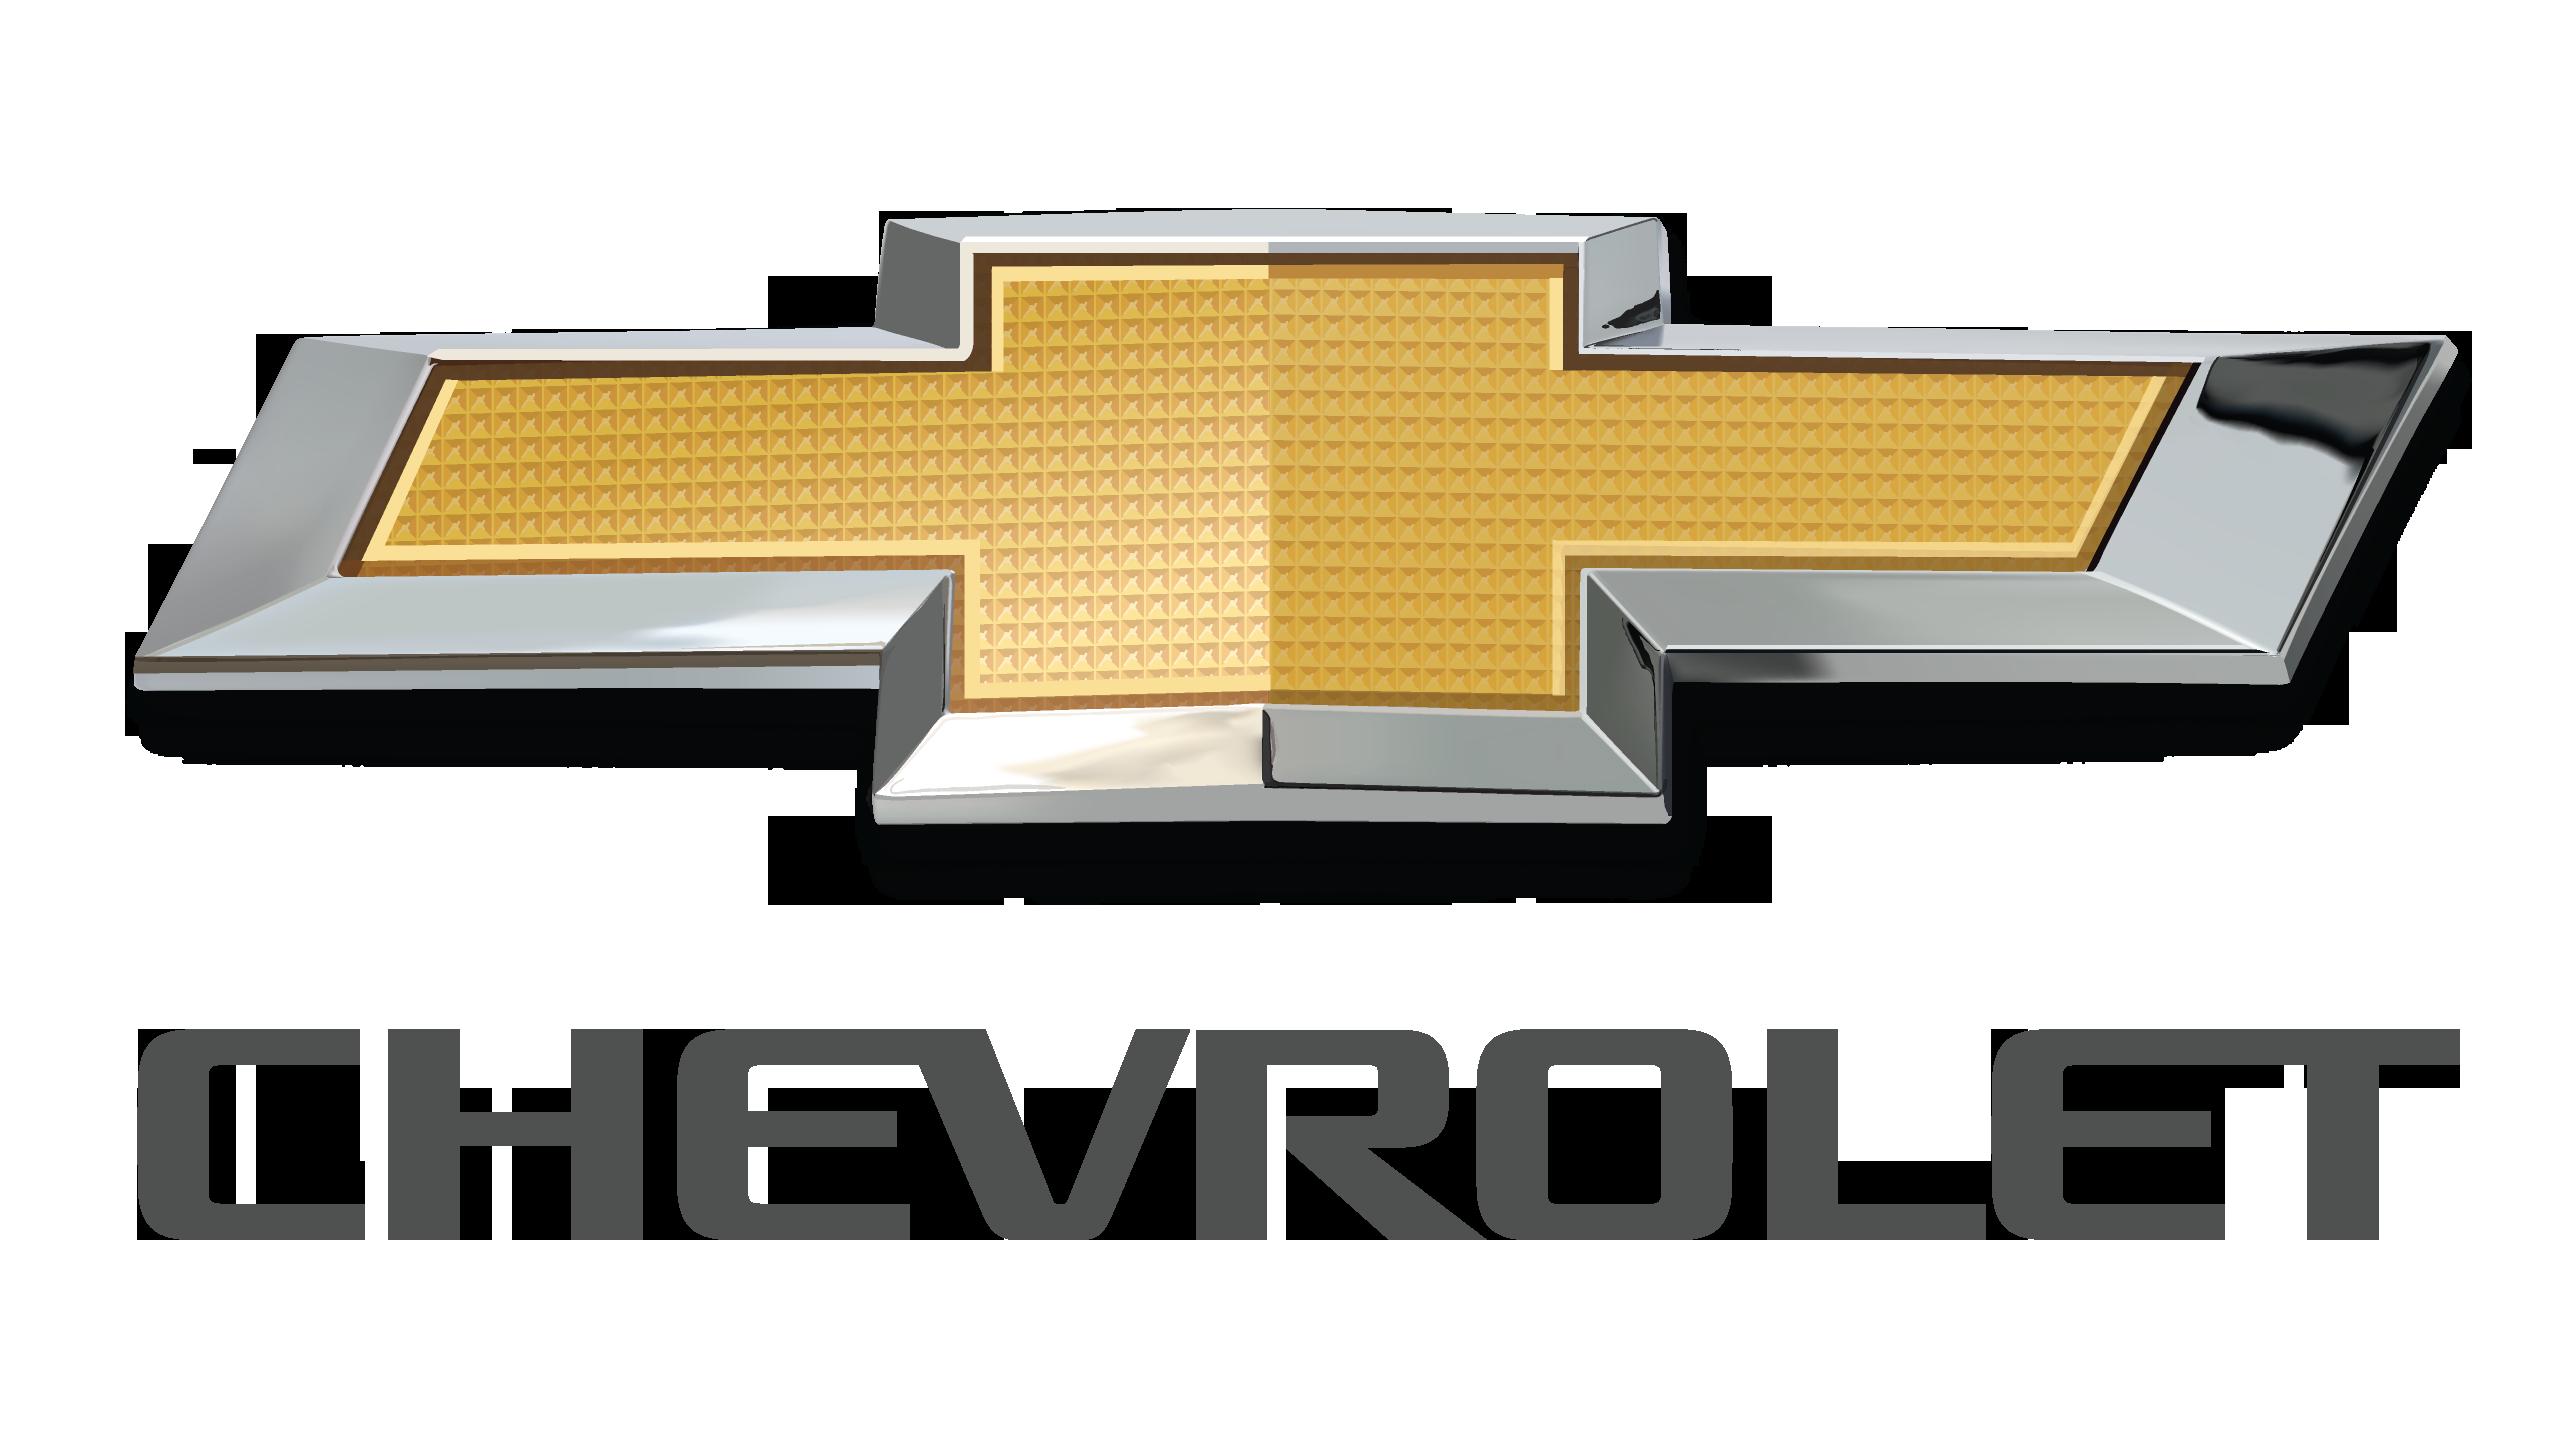 Chevrolet Thumb